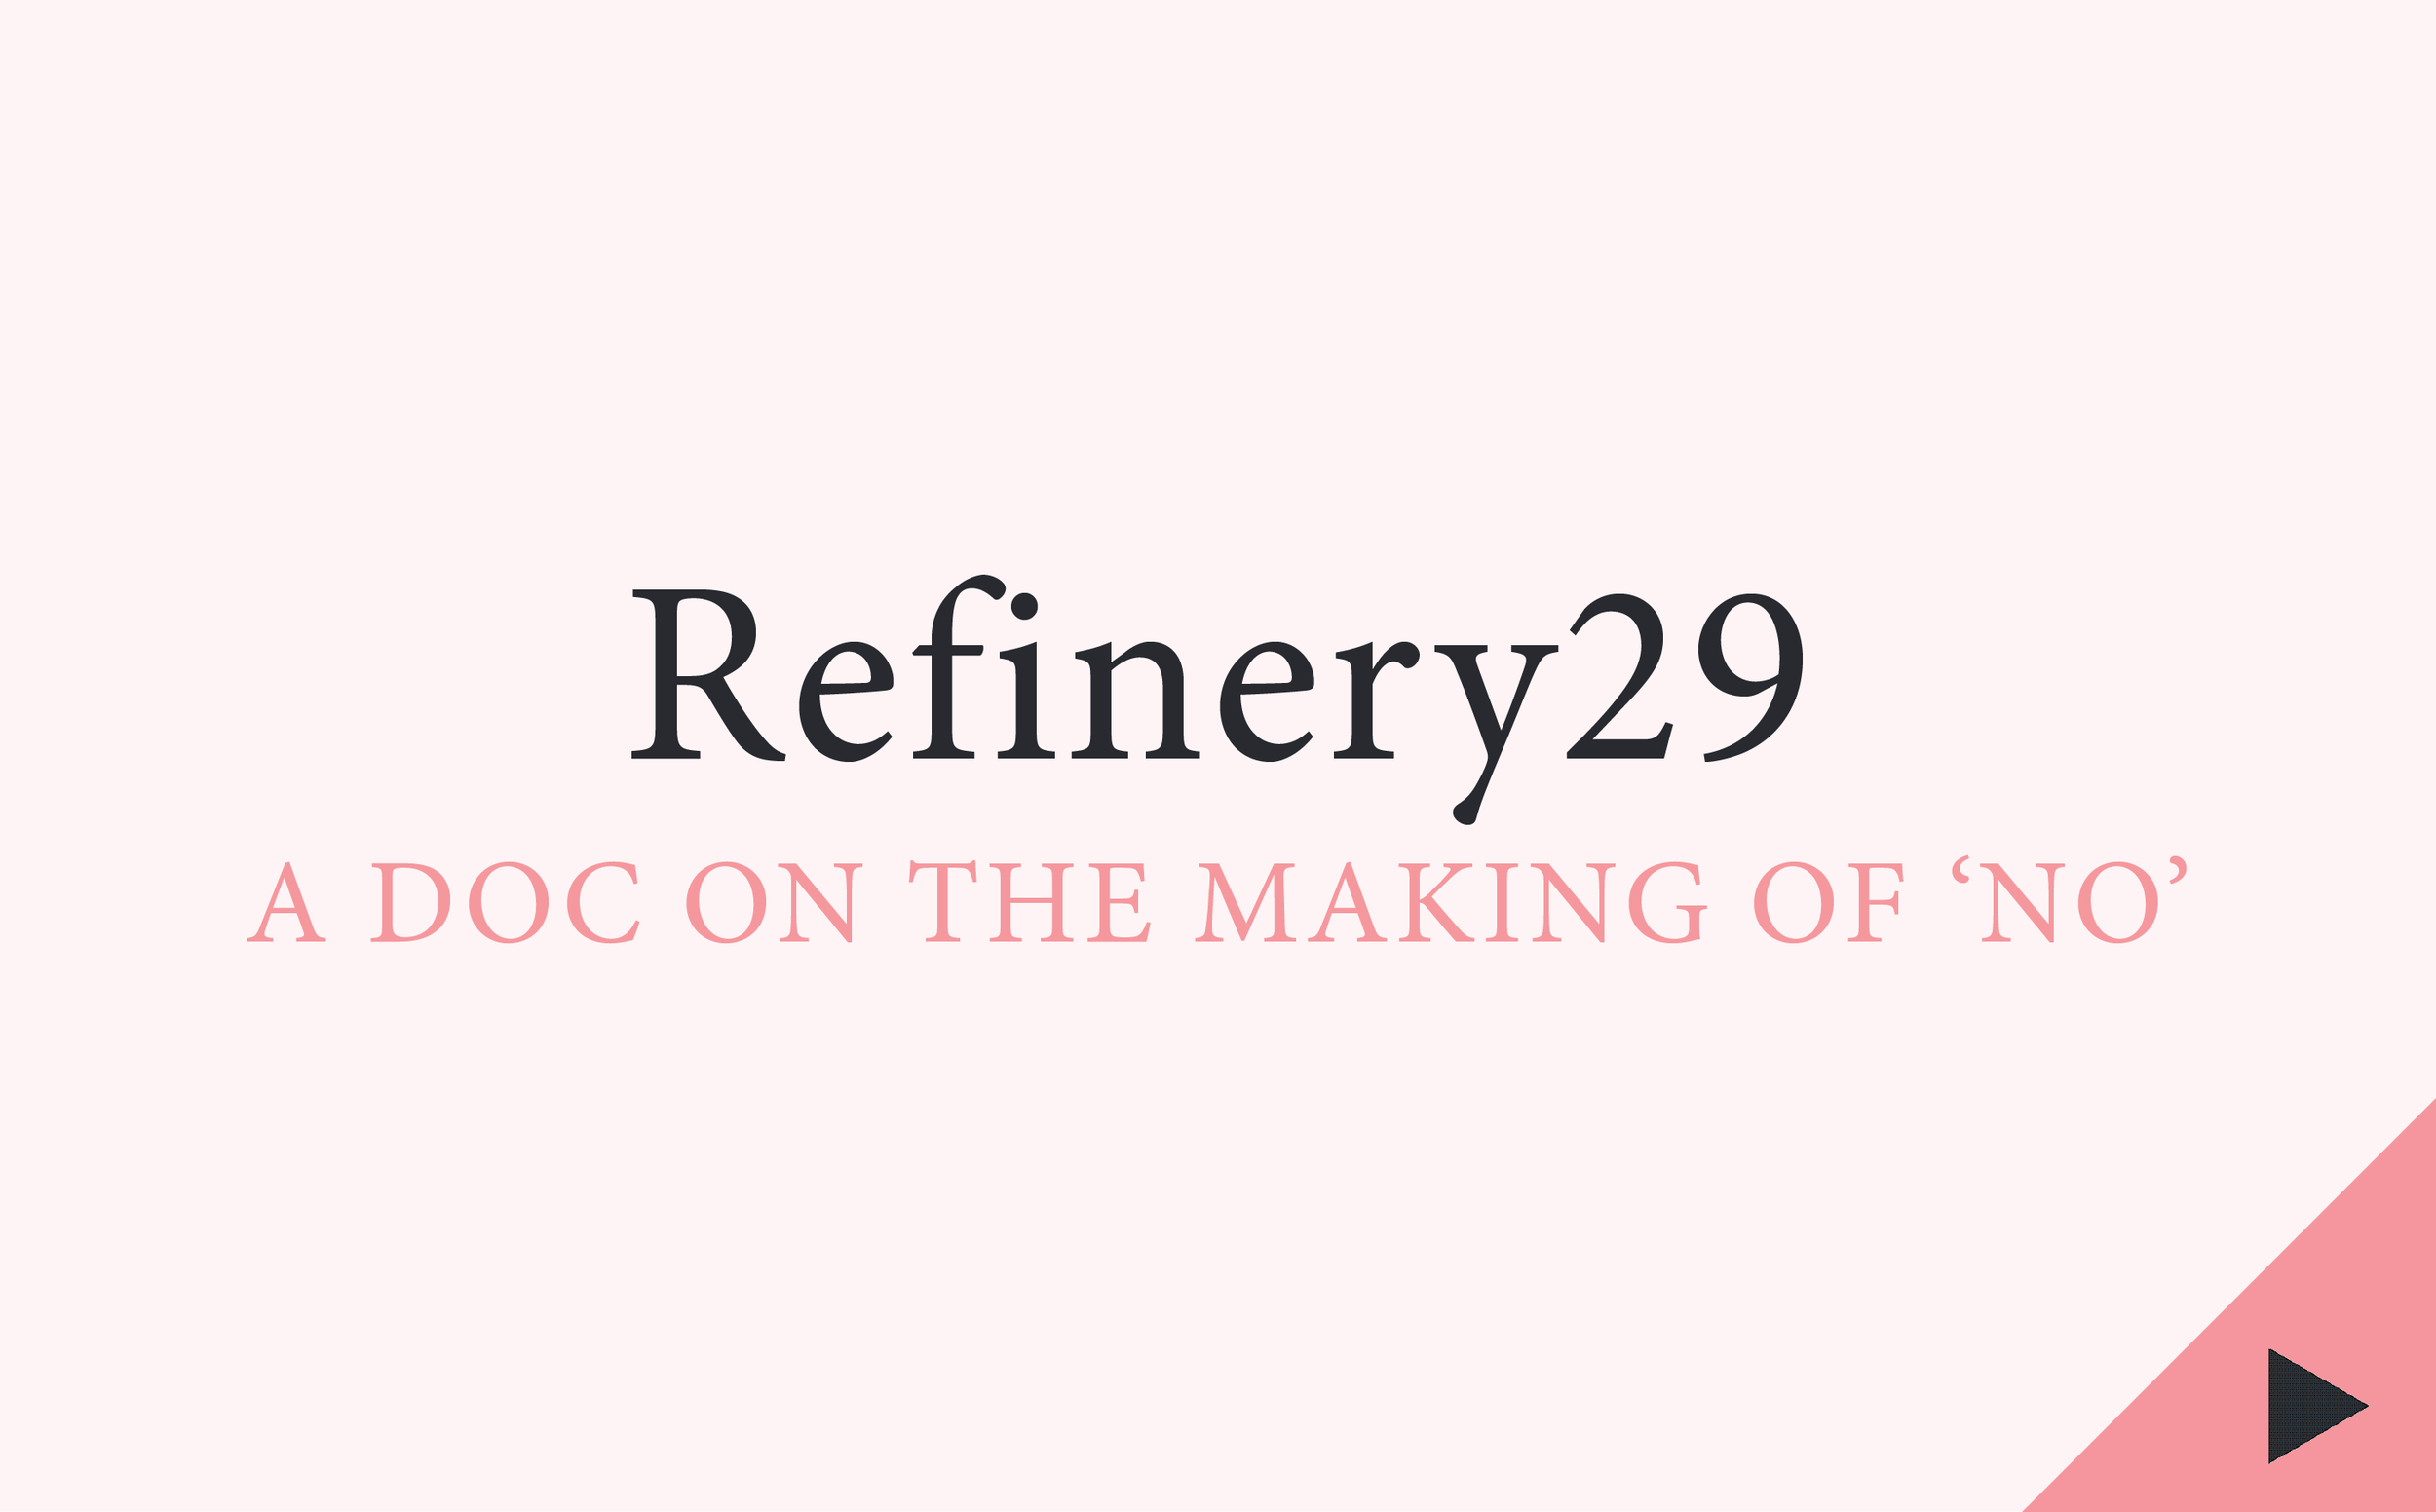 refinery 29, r29, refinery29